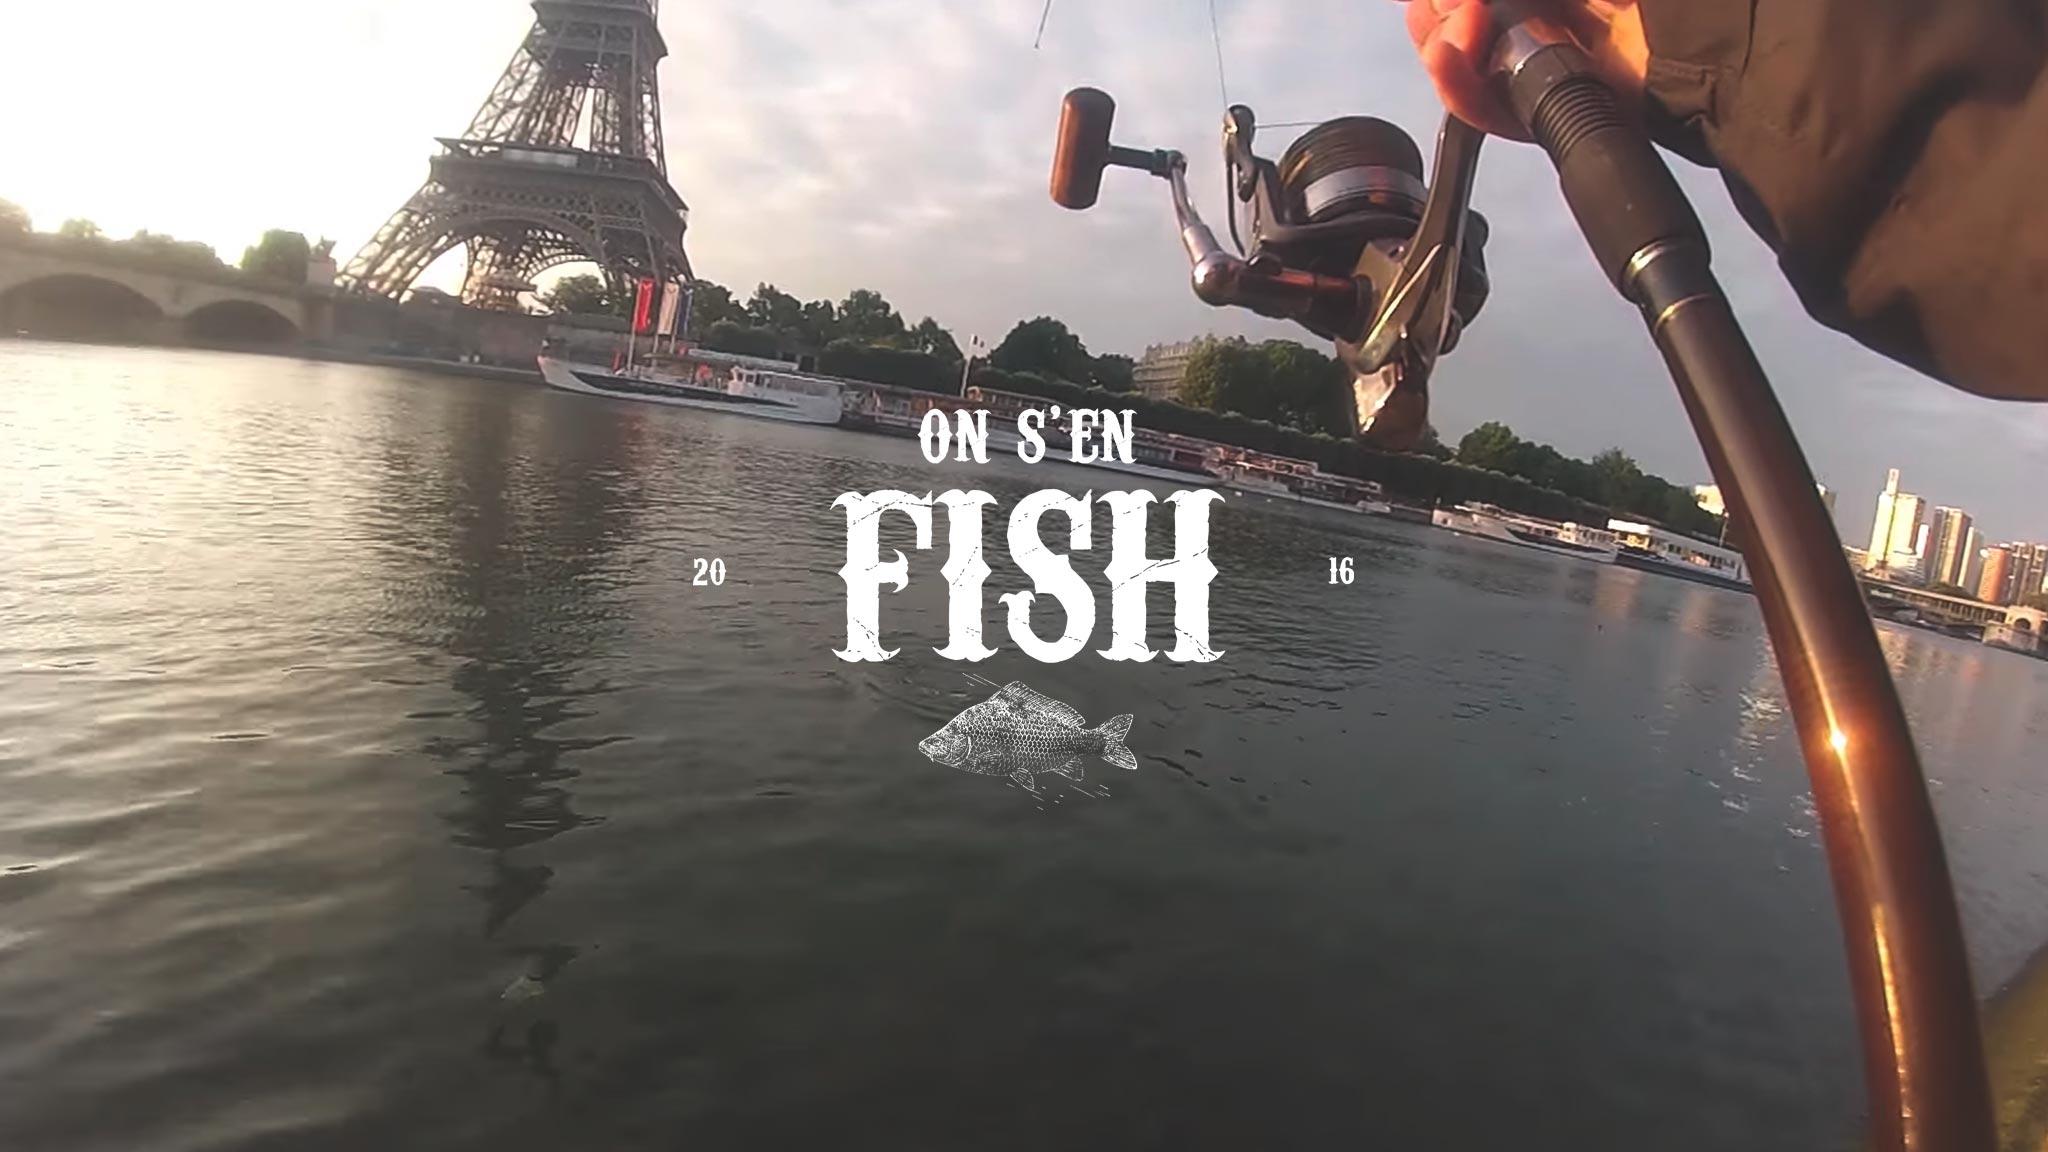 on-s-en-fish-header-article-street-fishing-paris